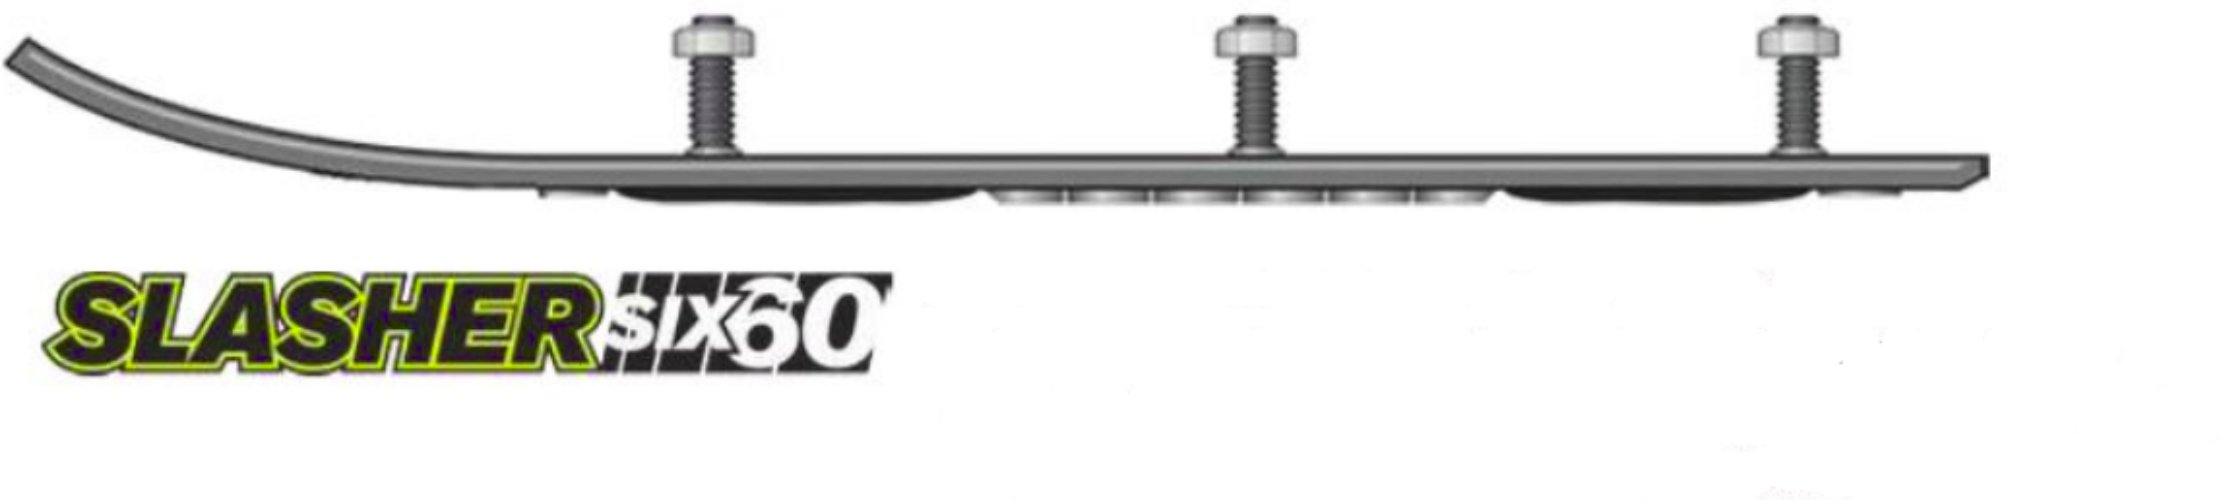 SPI Slasher Wearbar and Carbides for POLARIS TURBO IQ 2008-2011